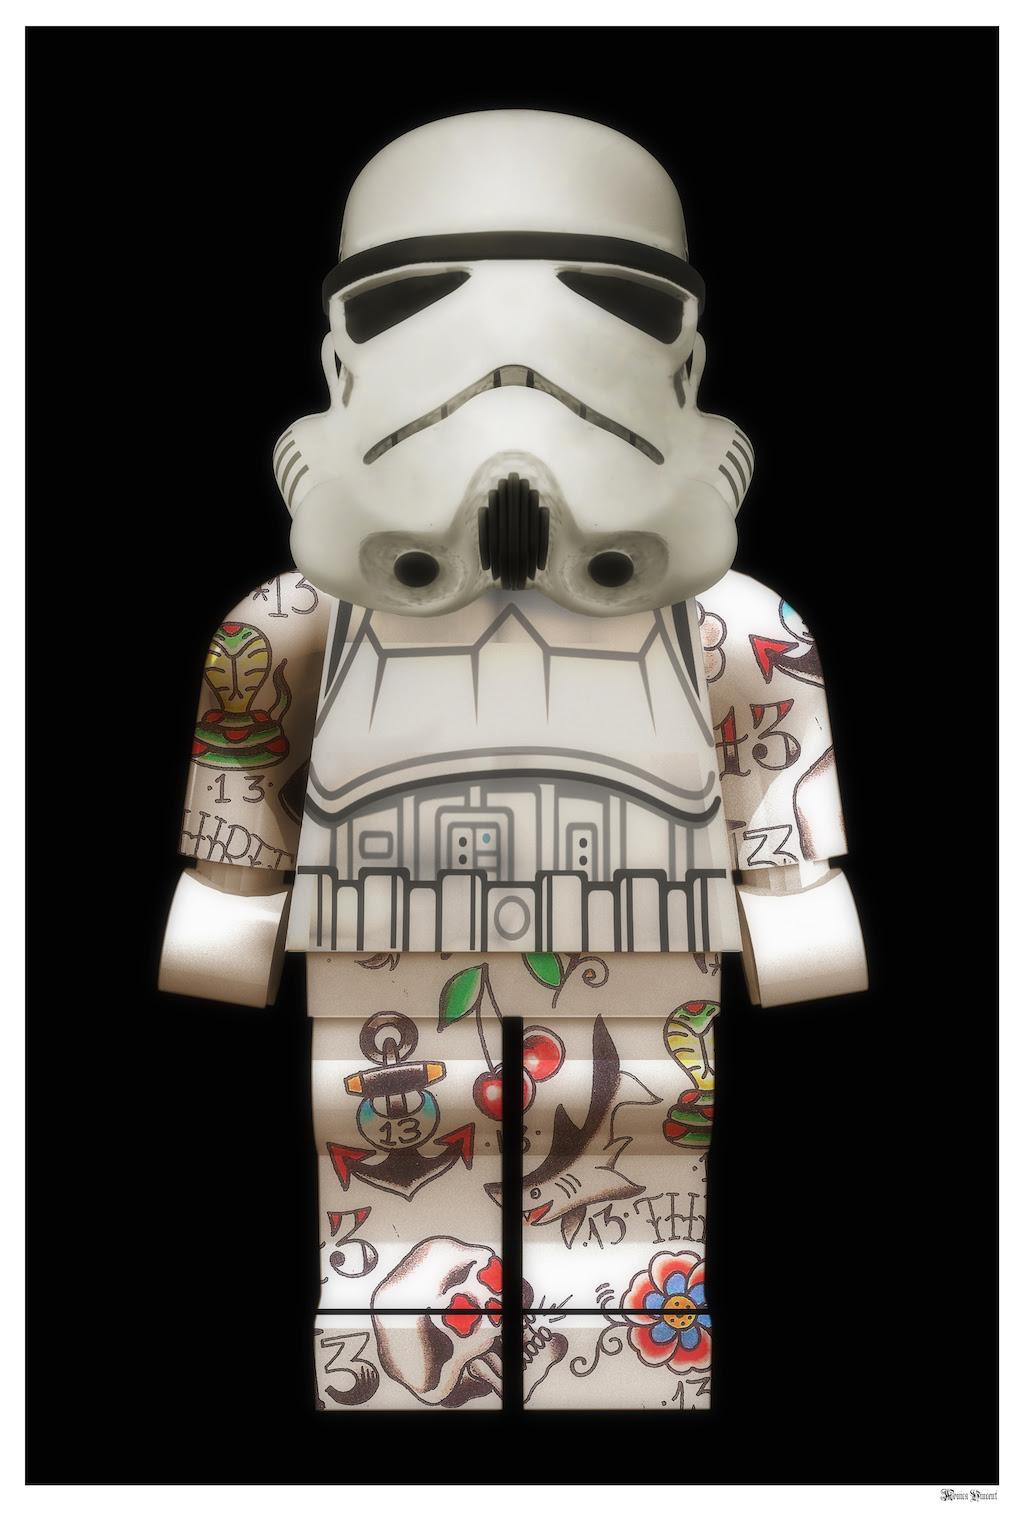 Lego Storm Trooper (Black Background) - Small - Framed by Monica Vincent